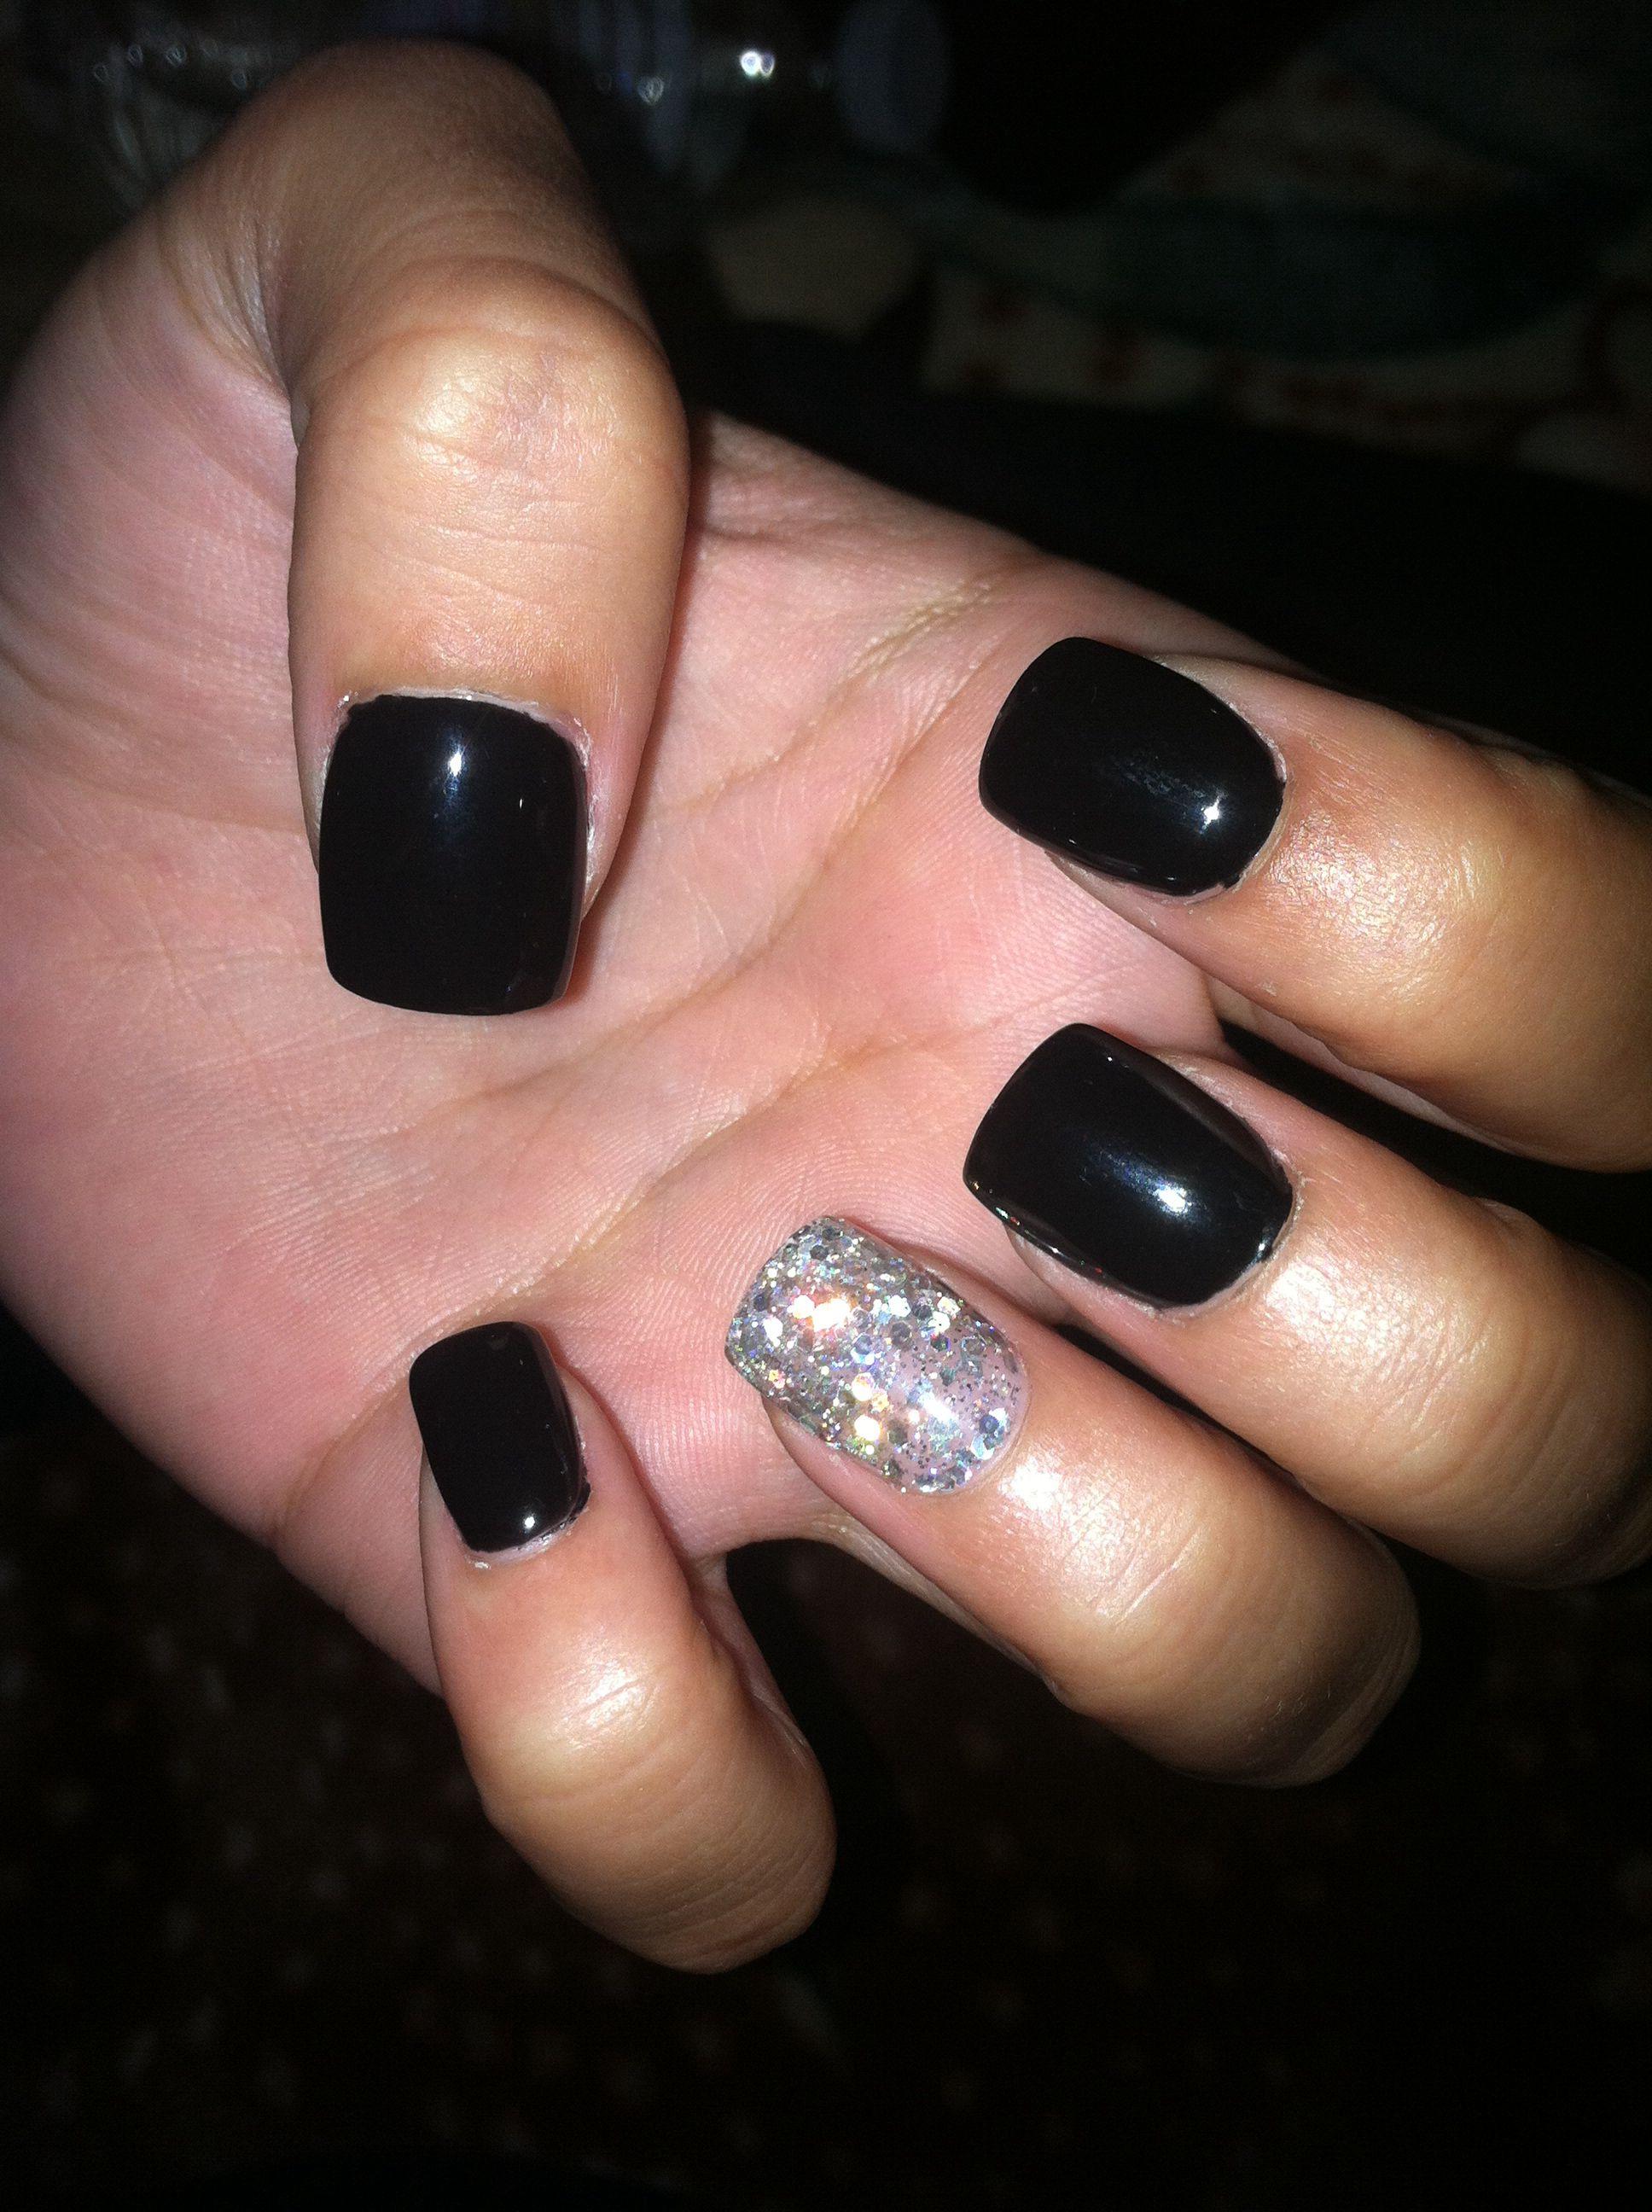 Pin By Liz Negrete On Nails Black Gel Nails Silver Glitter Nails Black Nails With Glitter